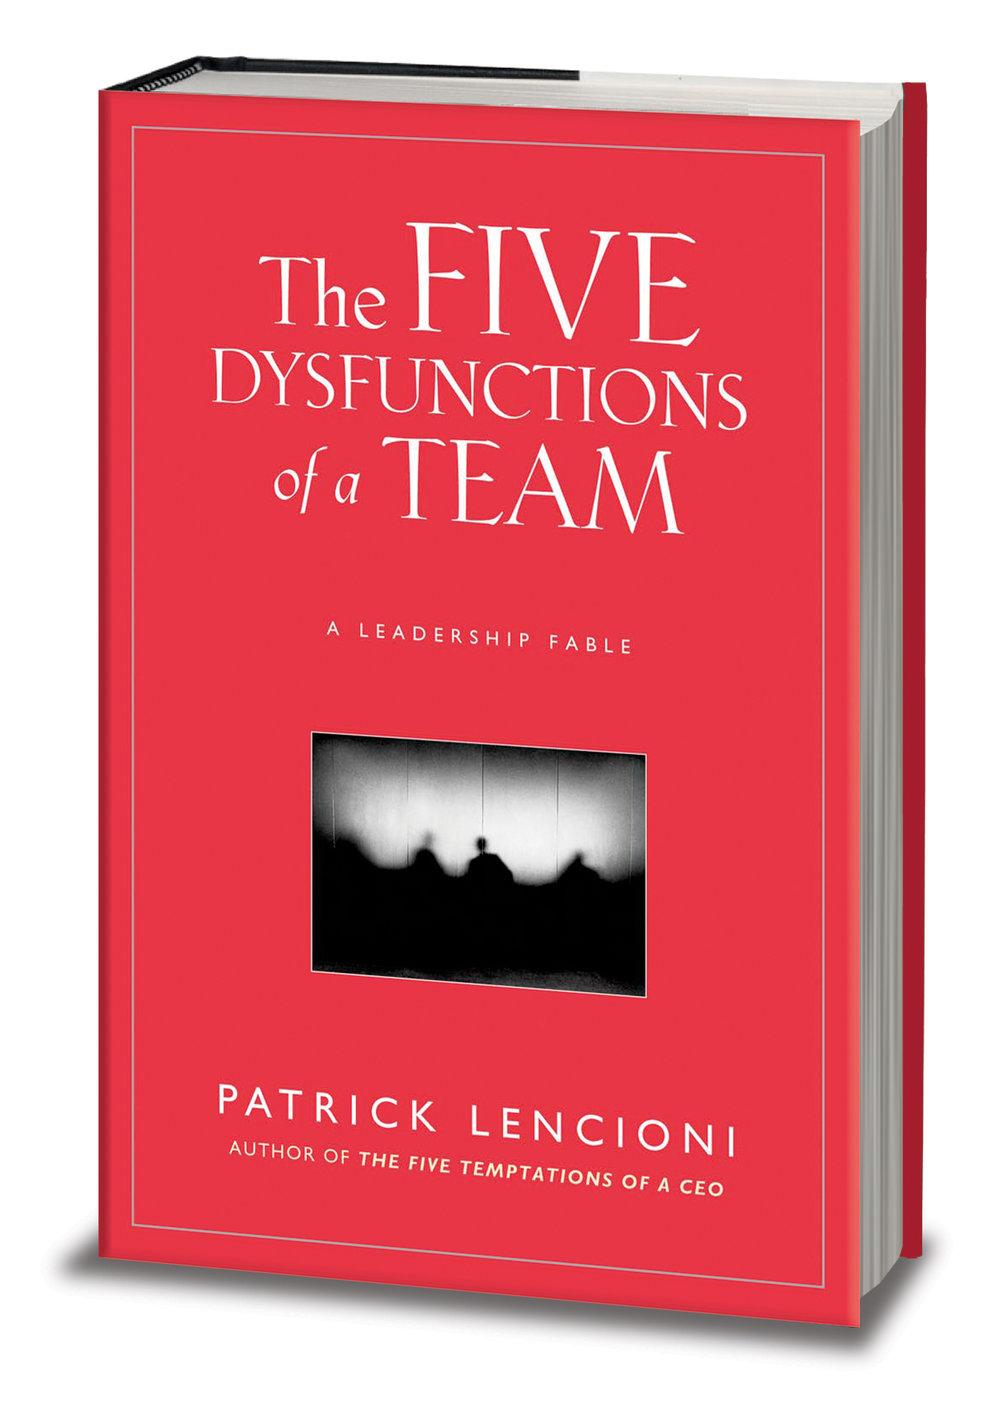 Five-Dysfunctions-book-jacket-3d.jpg